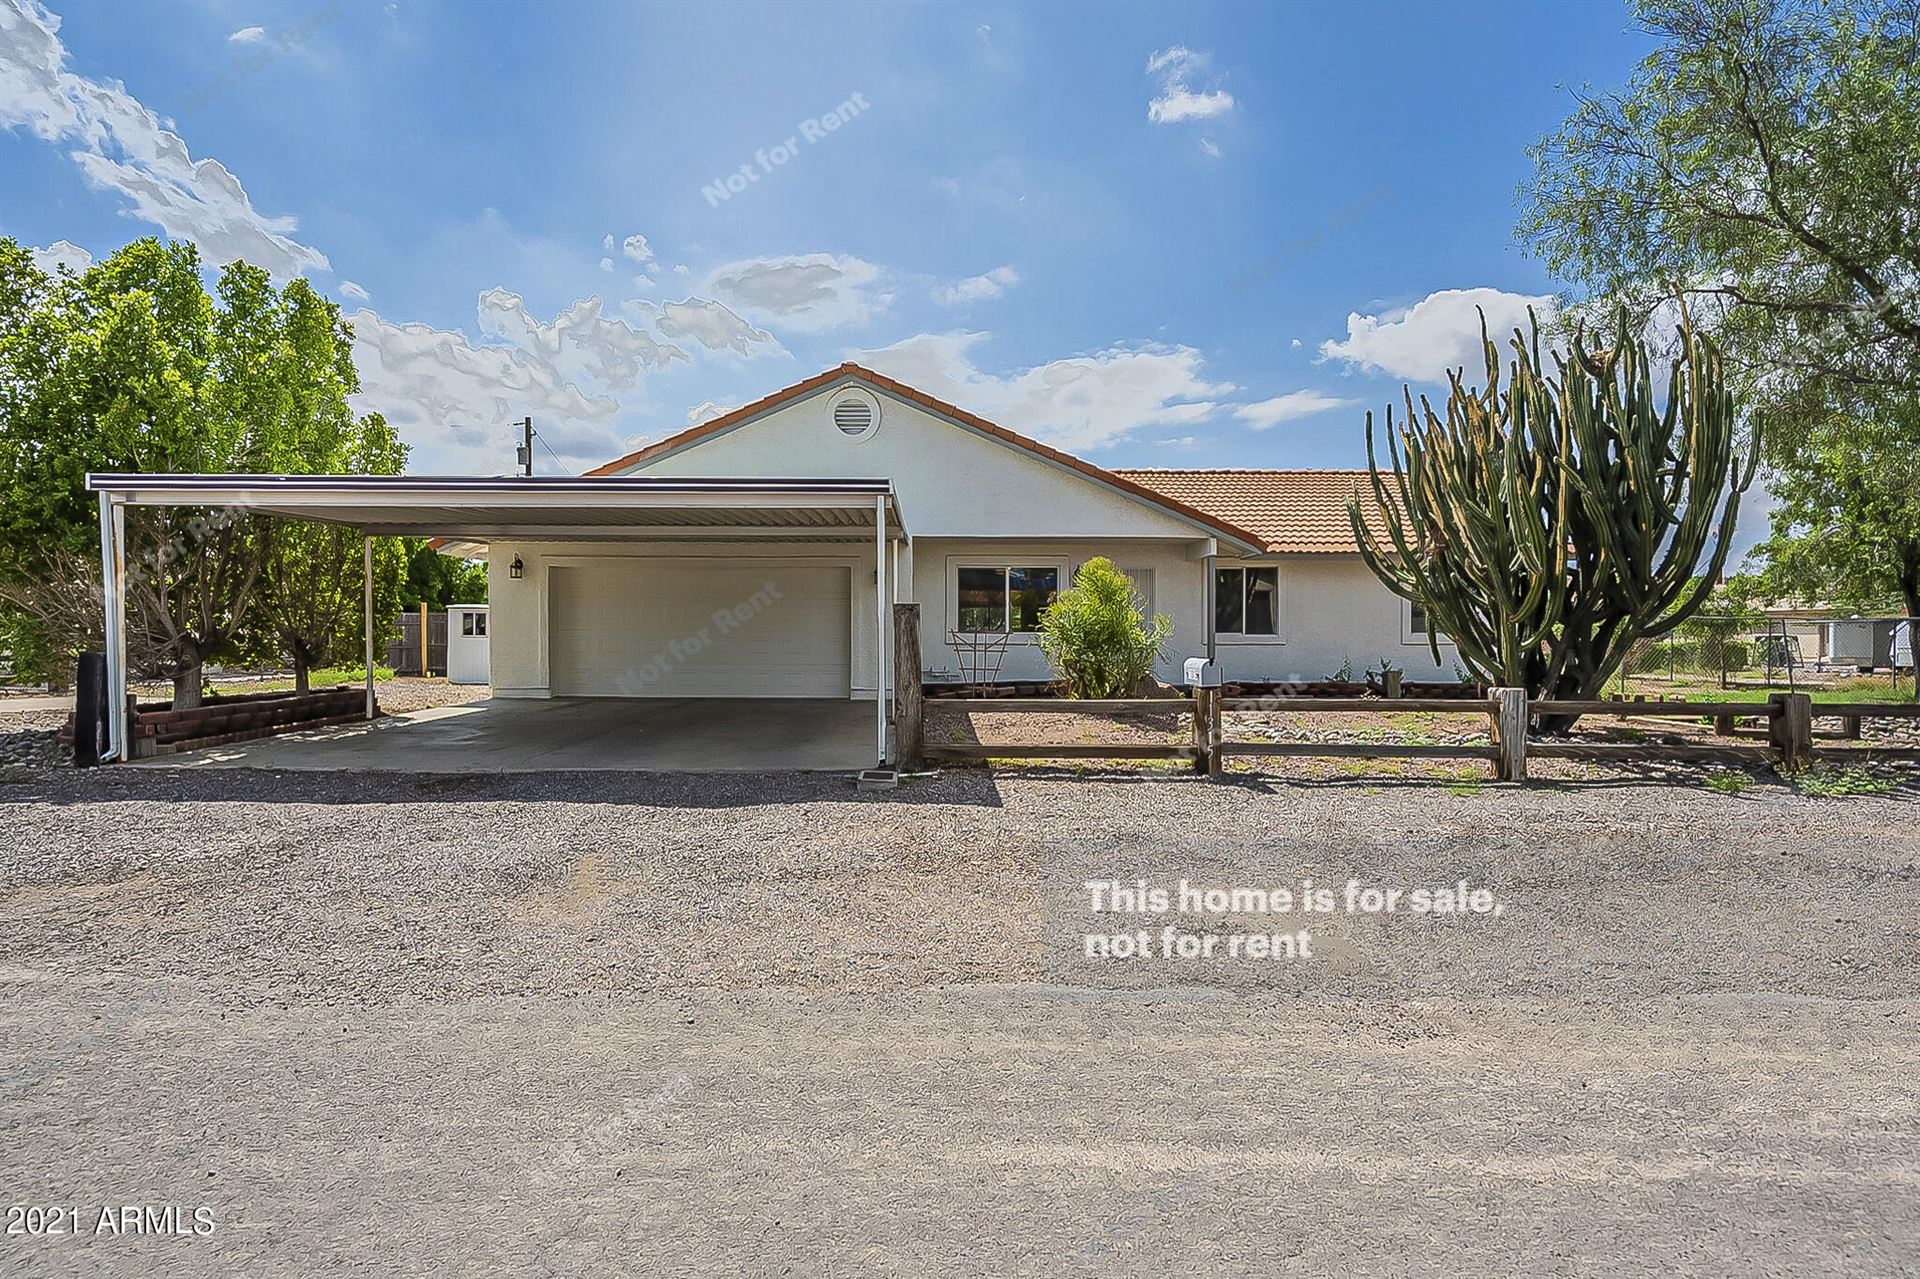 11315 E ELTON Avenue, Mesa, AZ 85208 - MLS#: 6288270